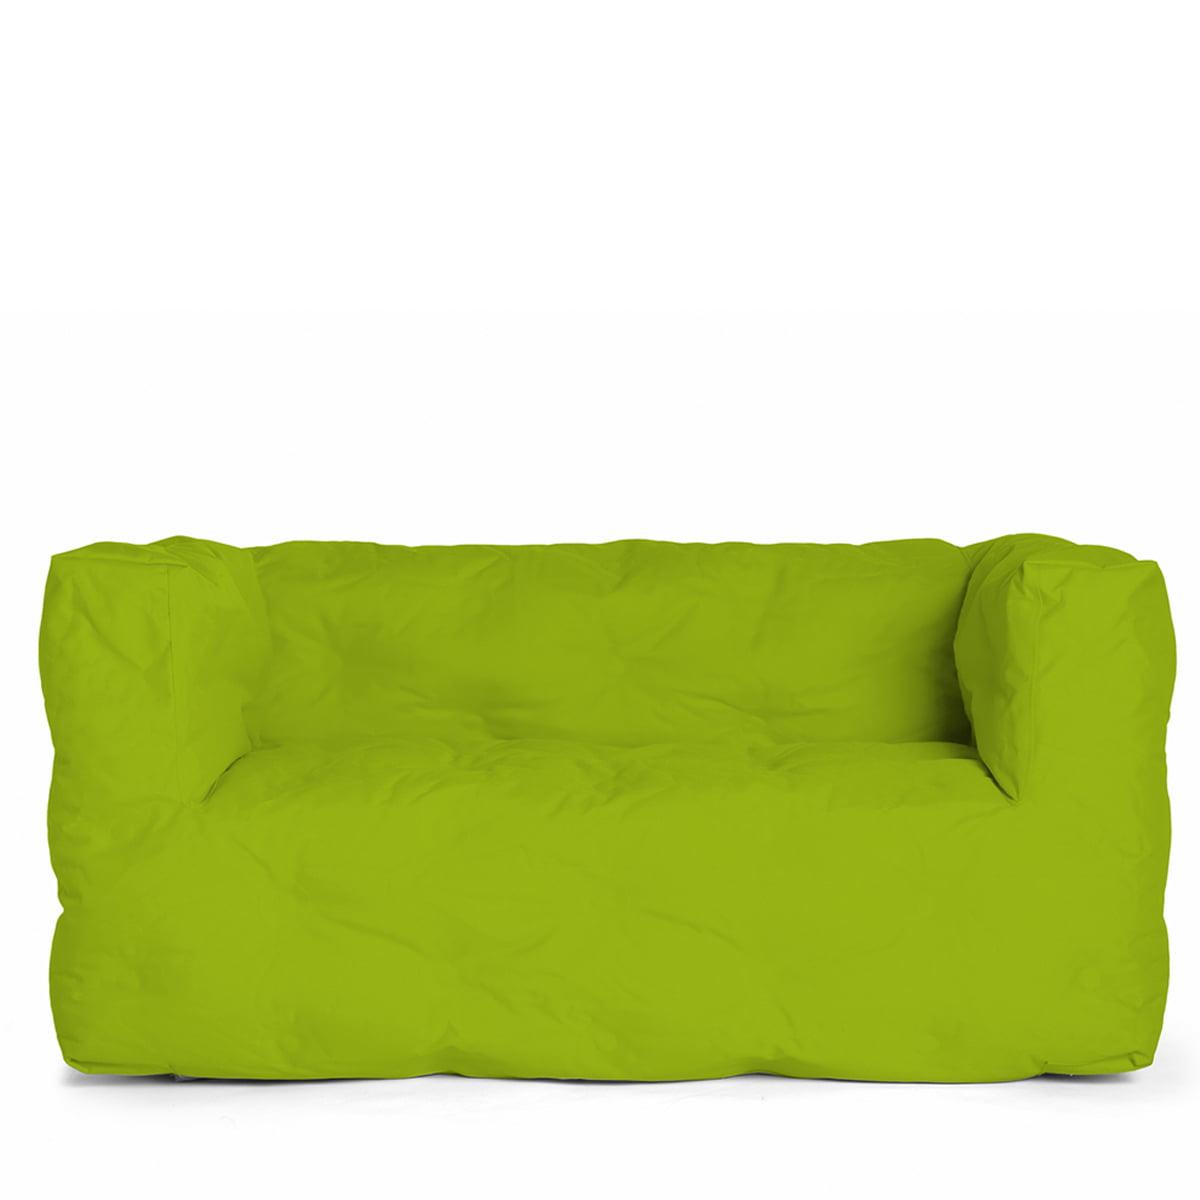 Inspirierend Hochlehner Sofa Ideen Von Couch I 2 Seater By Sitting Bull